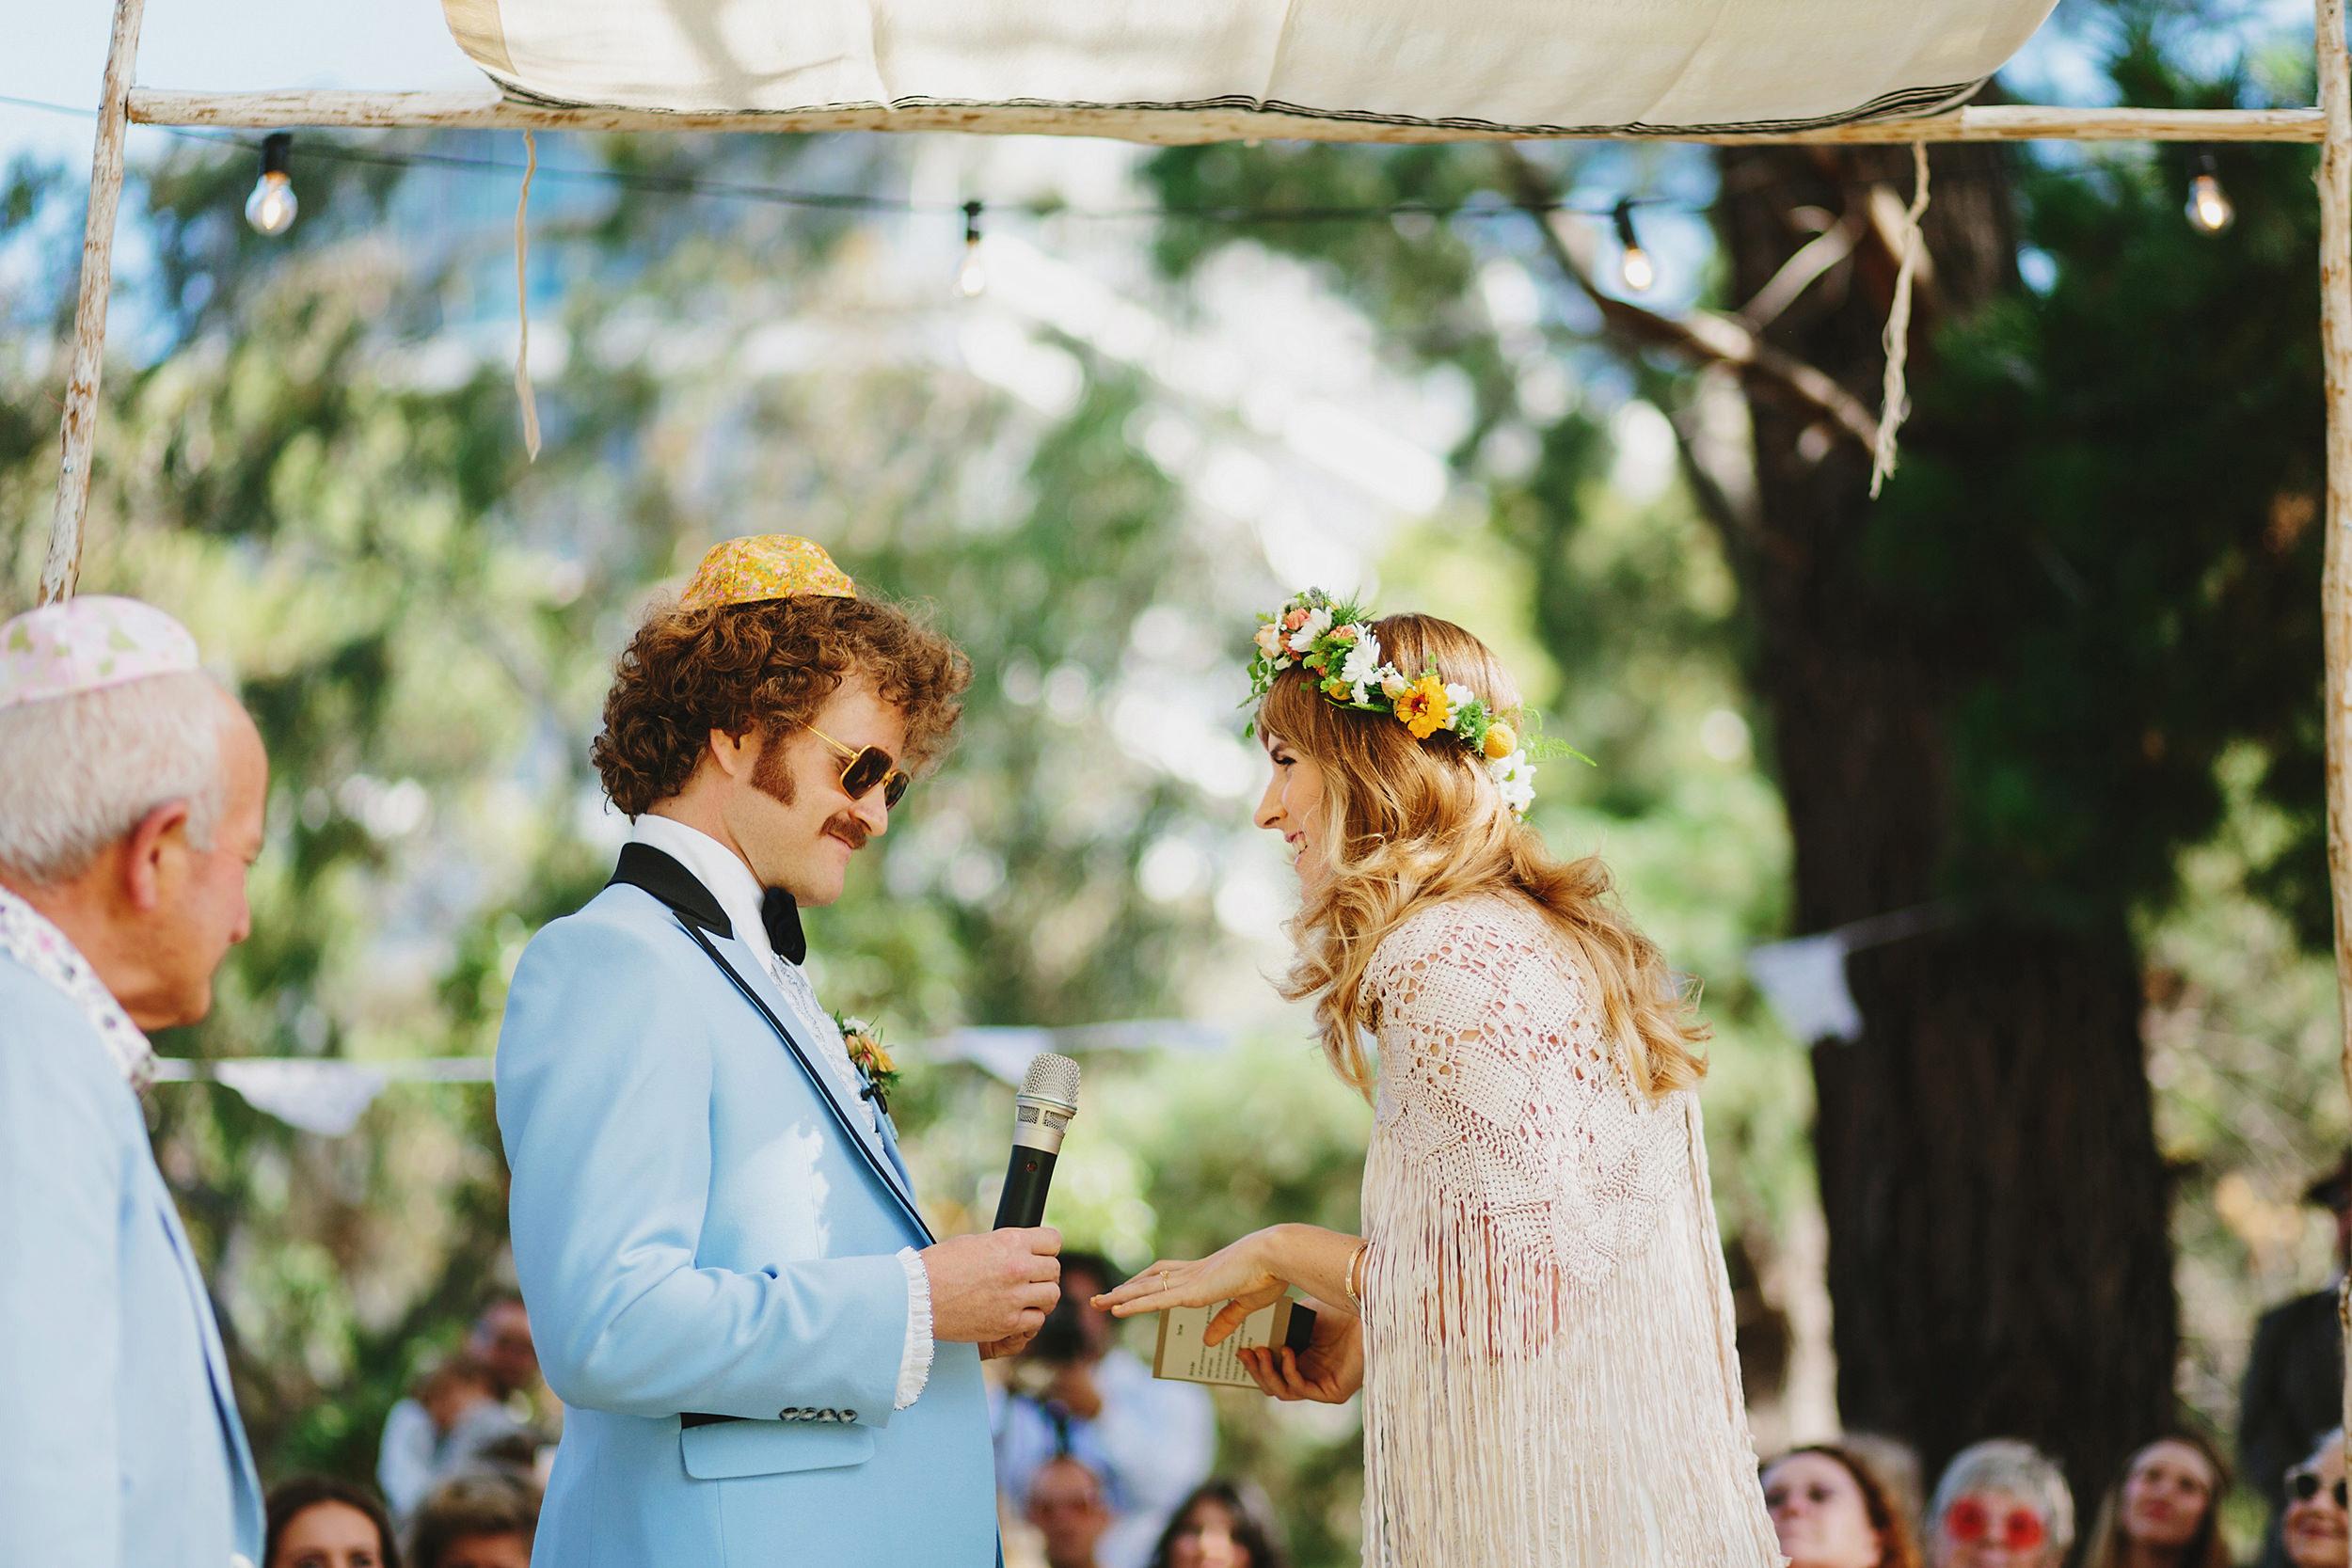 Melbourne_Vintage_Backyard_Wedding_Ben_Erin 033.JPG